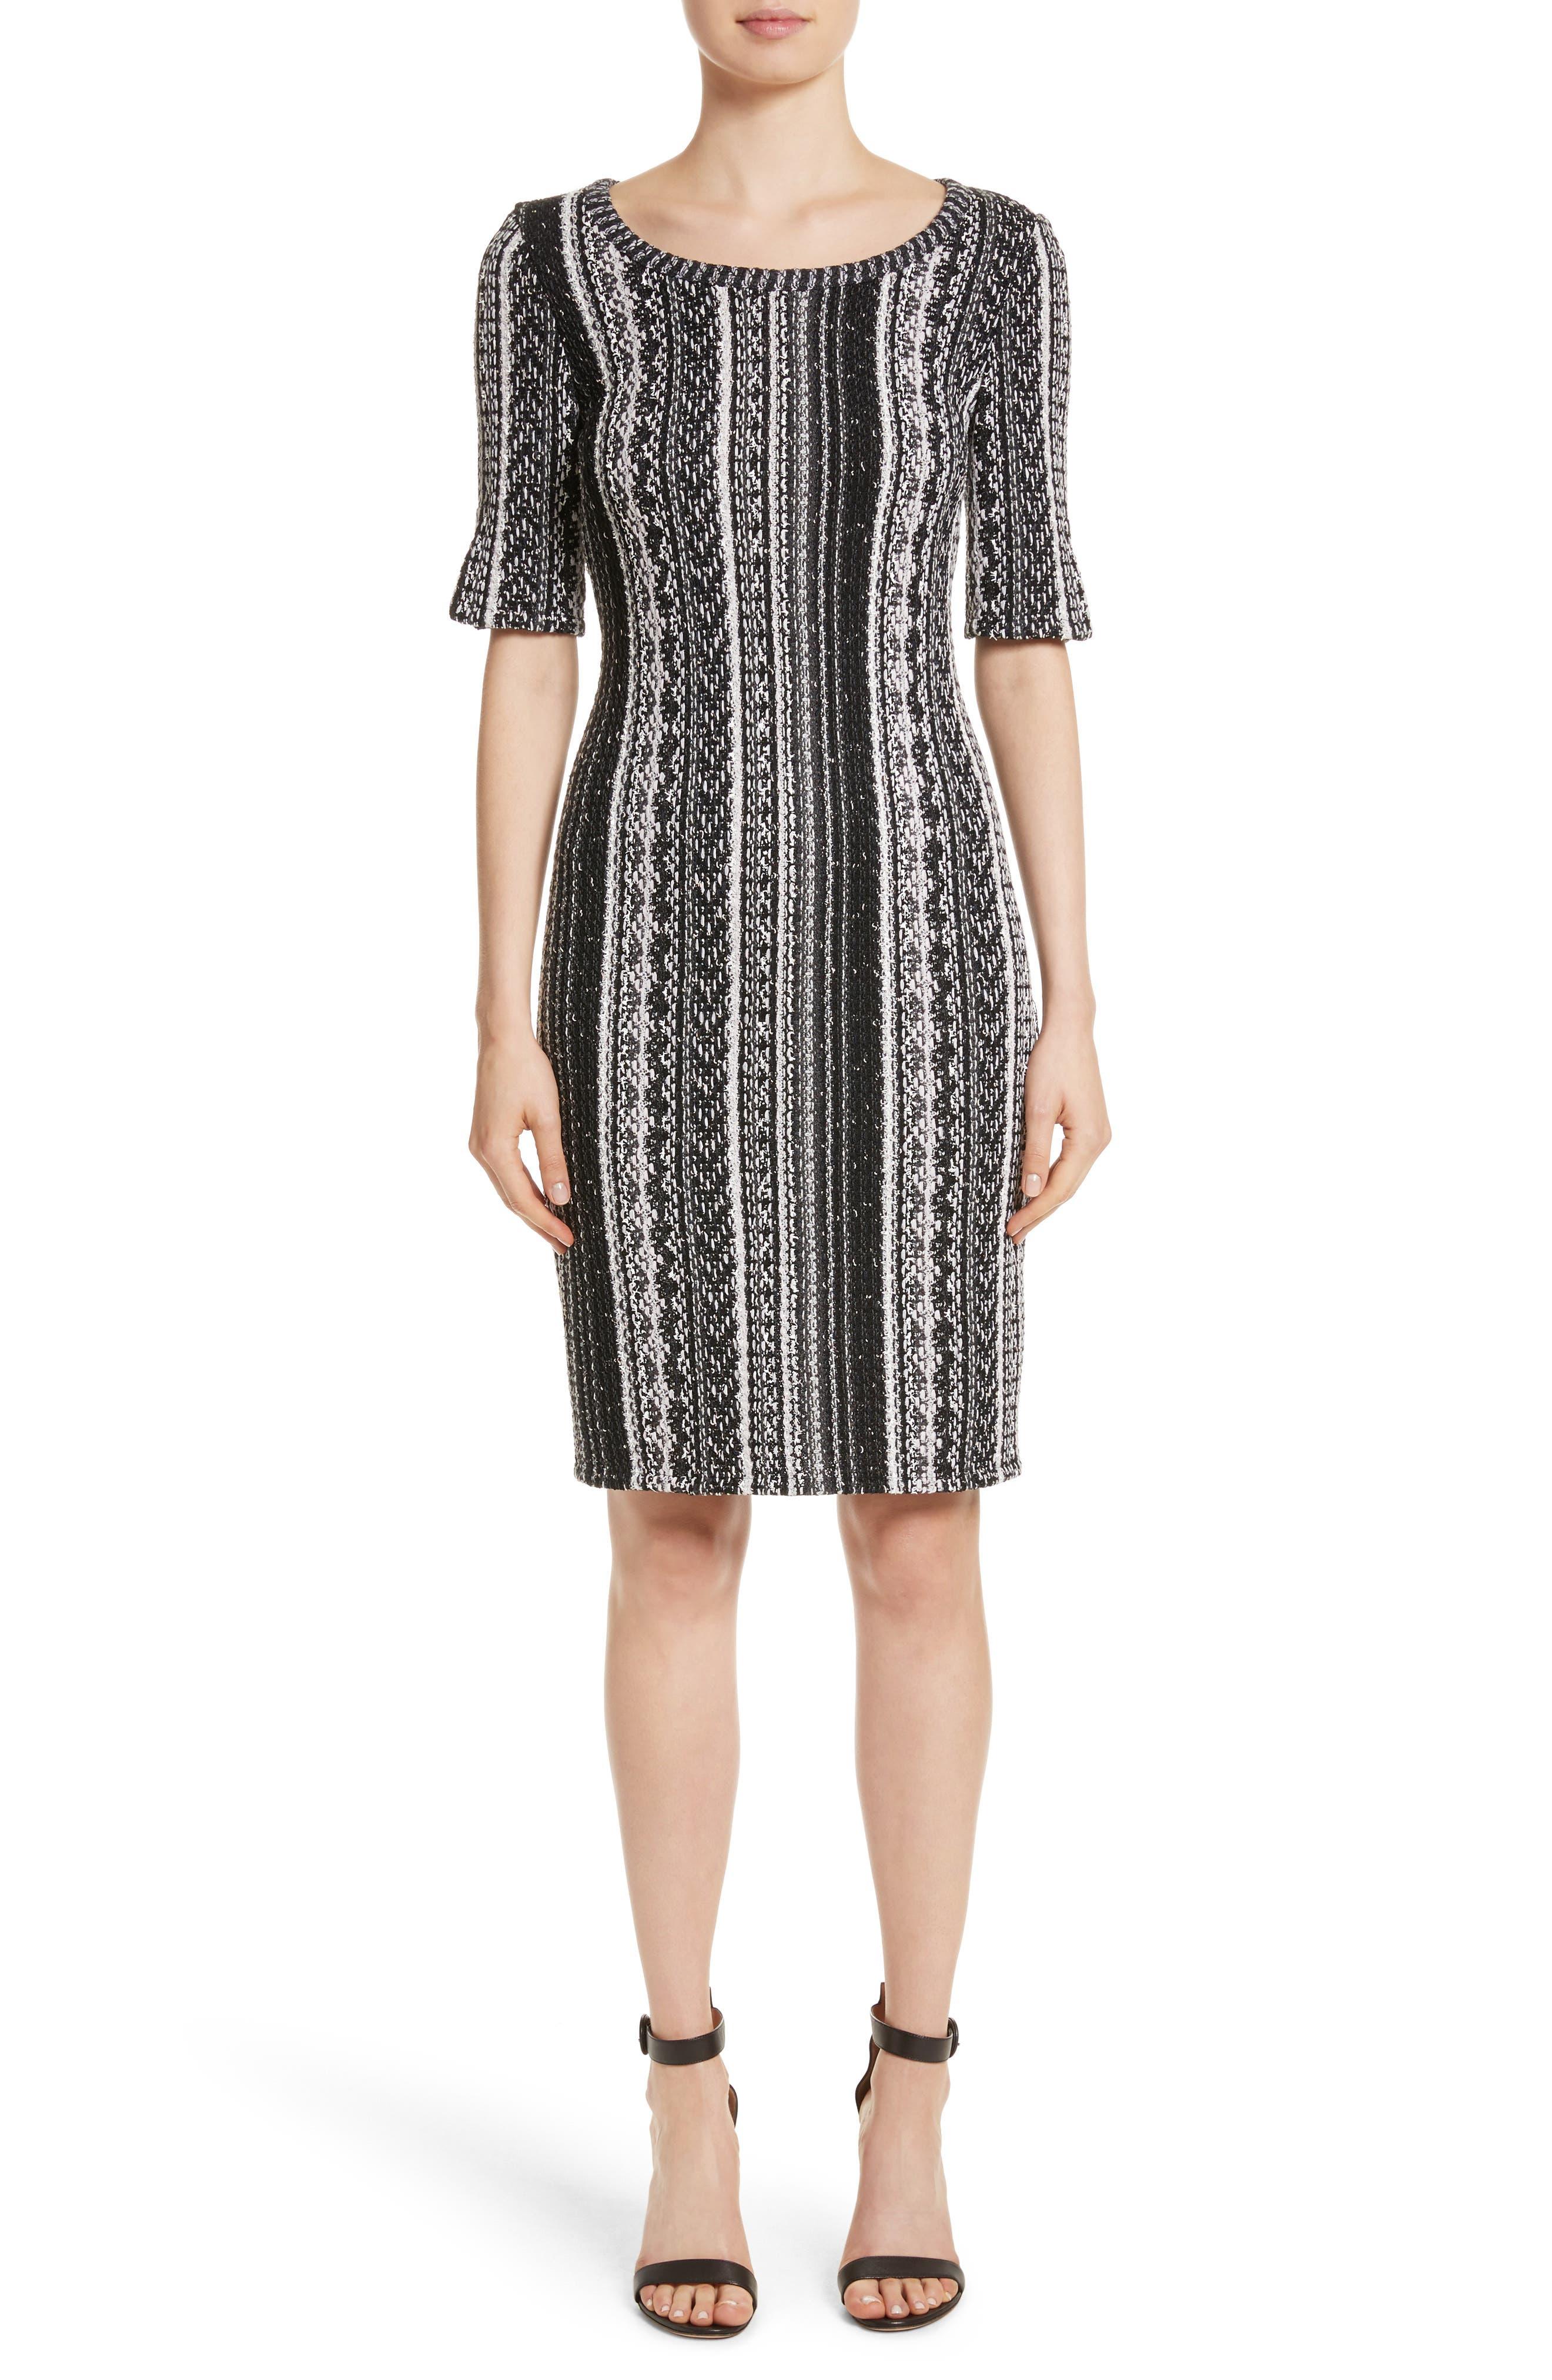 Designer Sheath Dresses